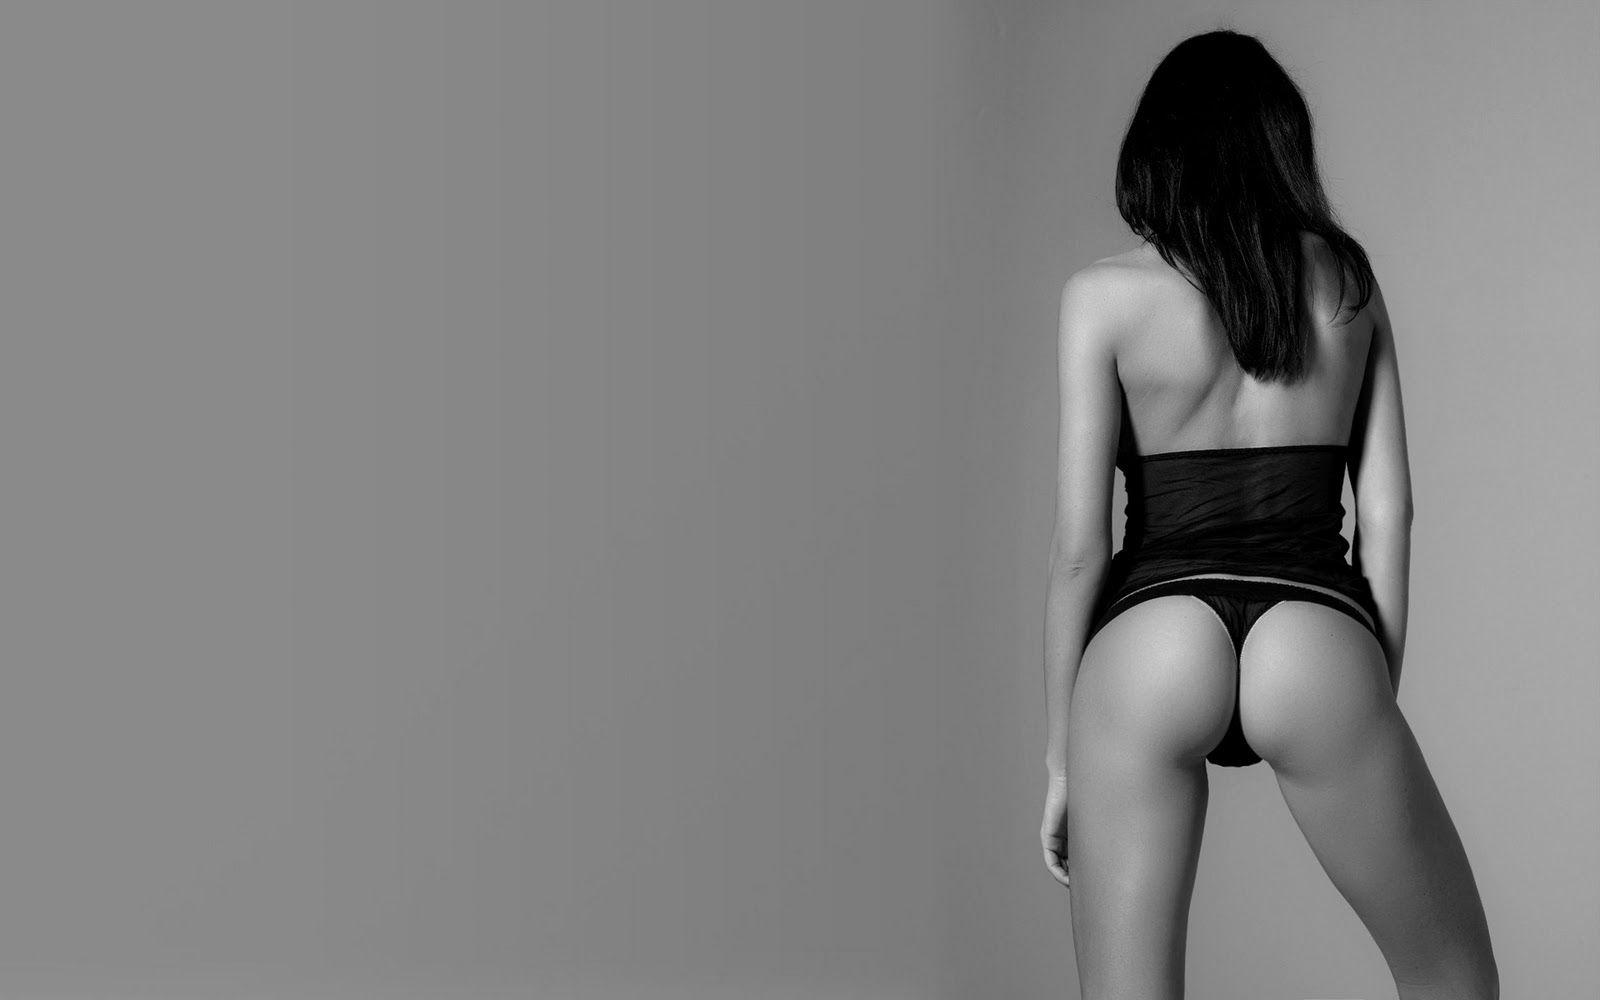 perfect ass desktop - google search | great arse | pinterest